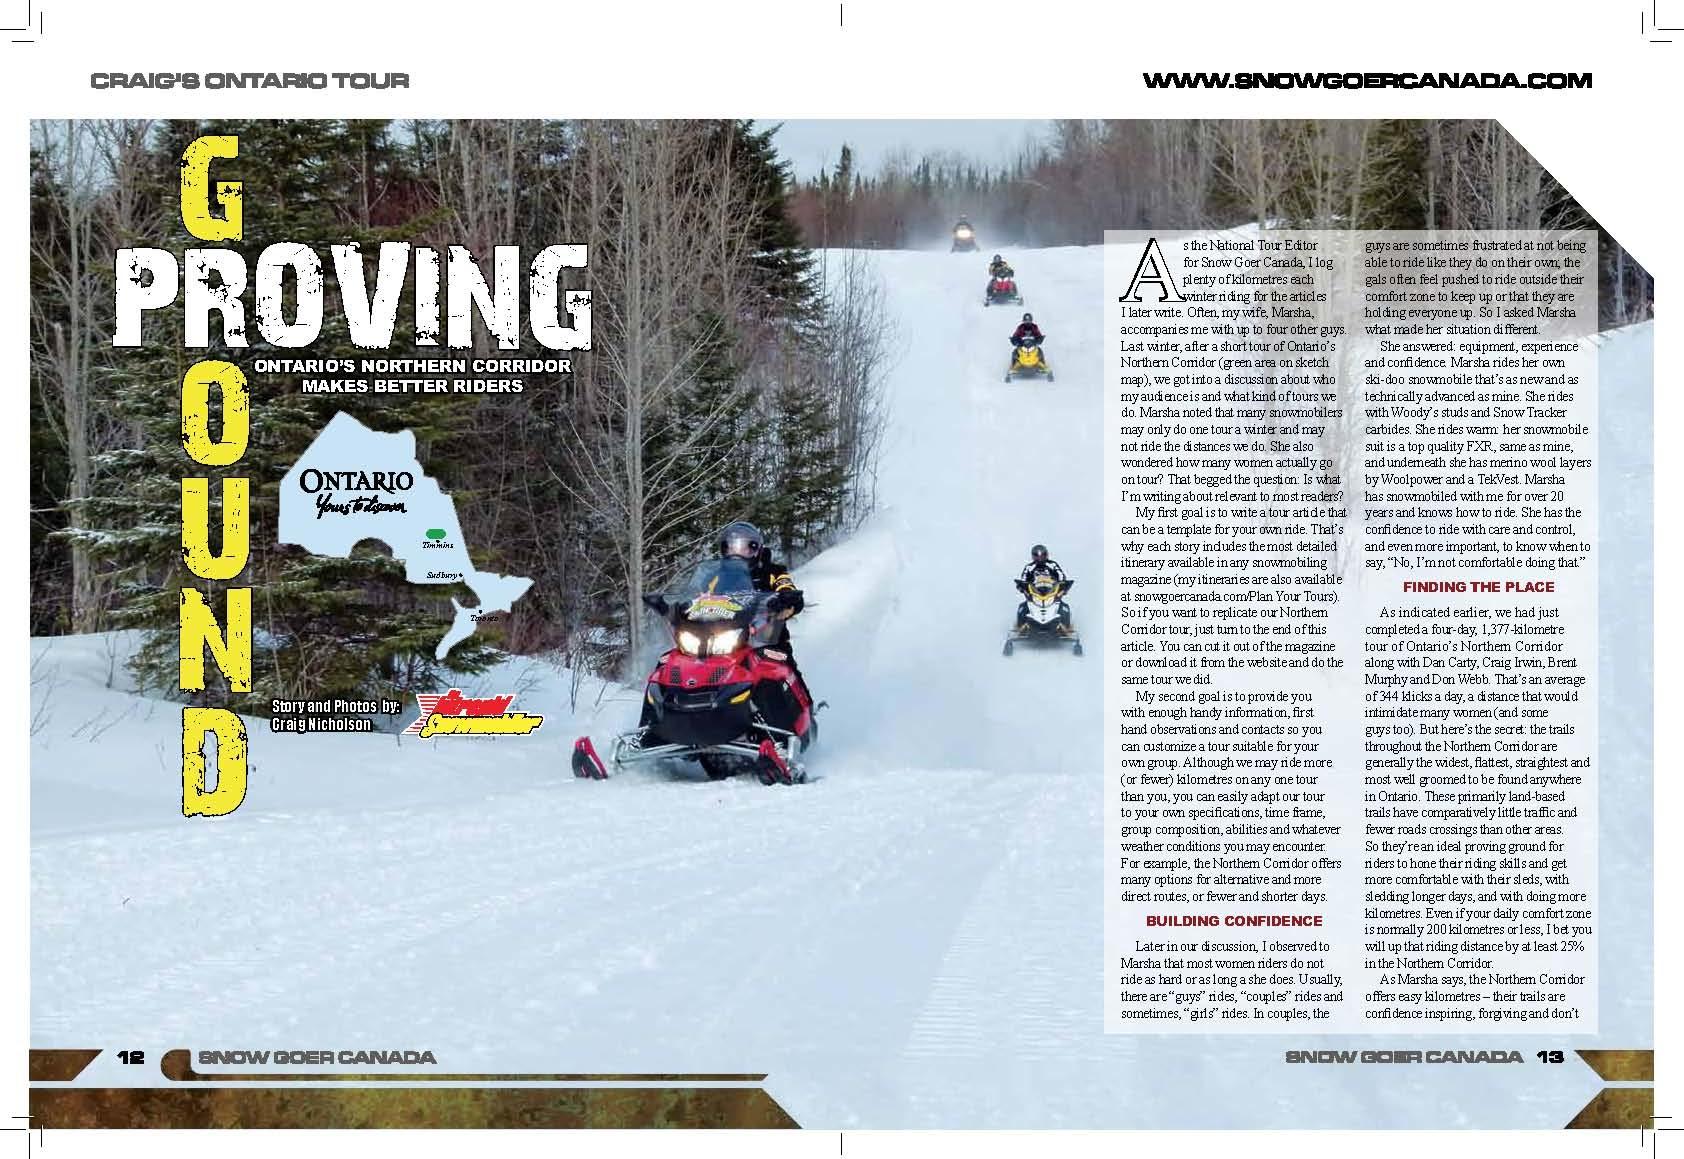 Northern Corridor snowmobiling